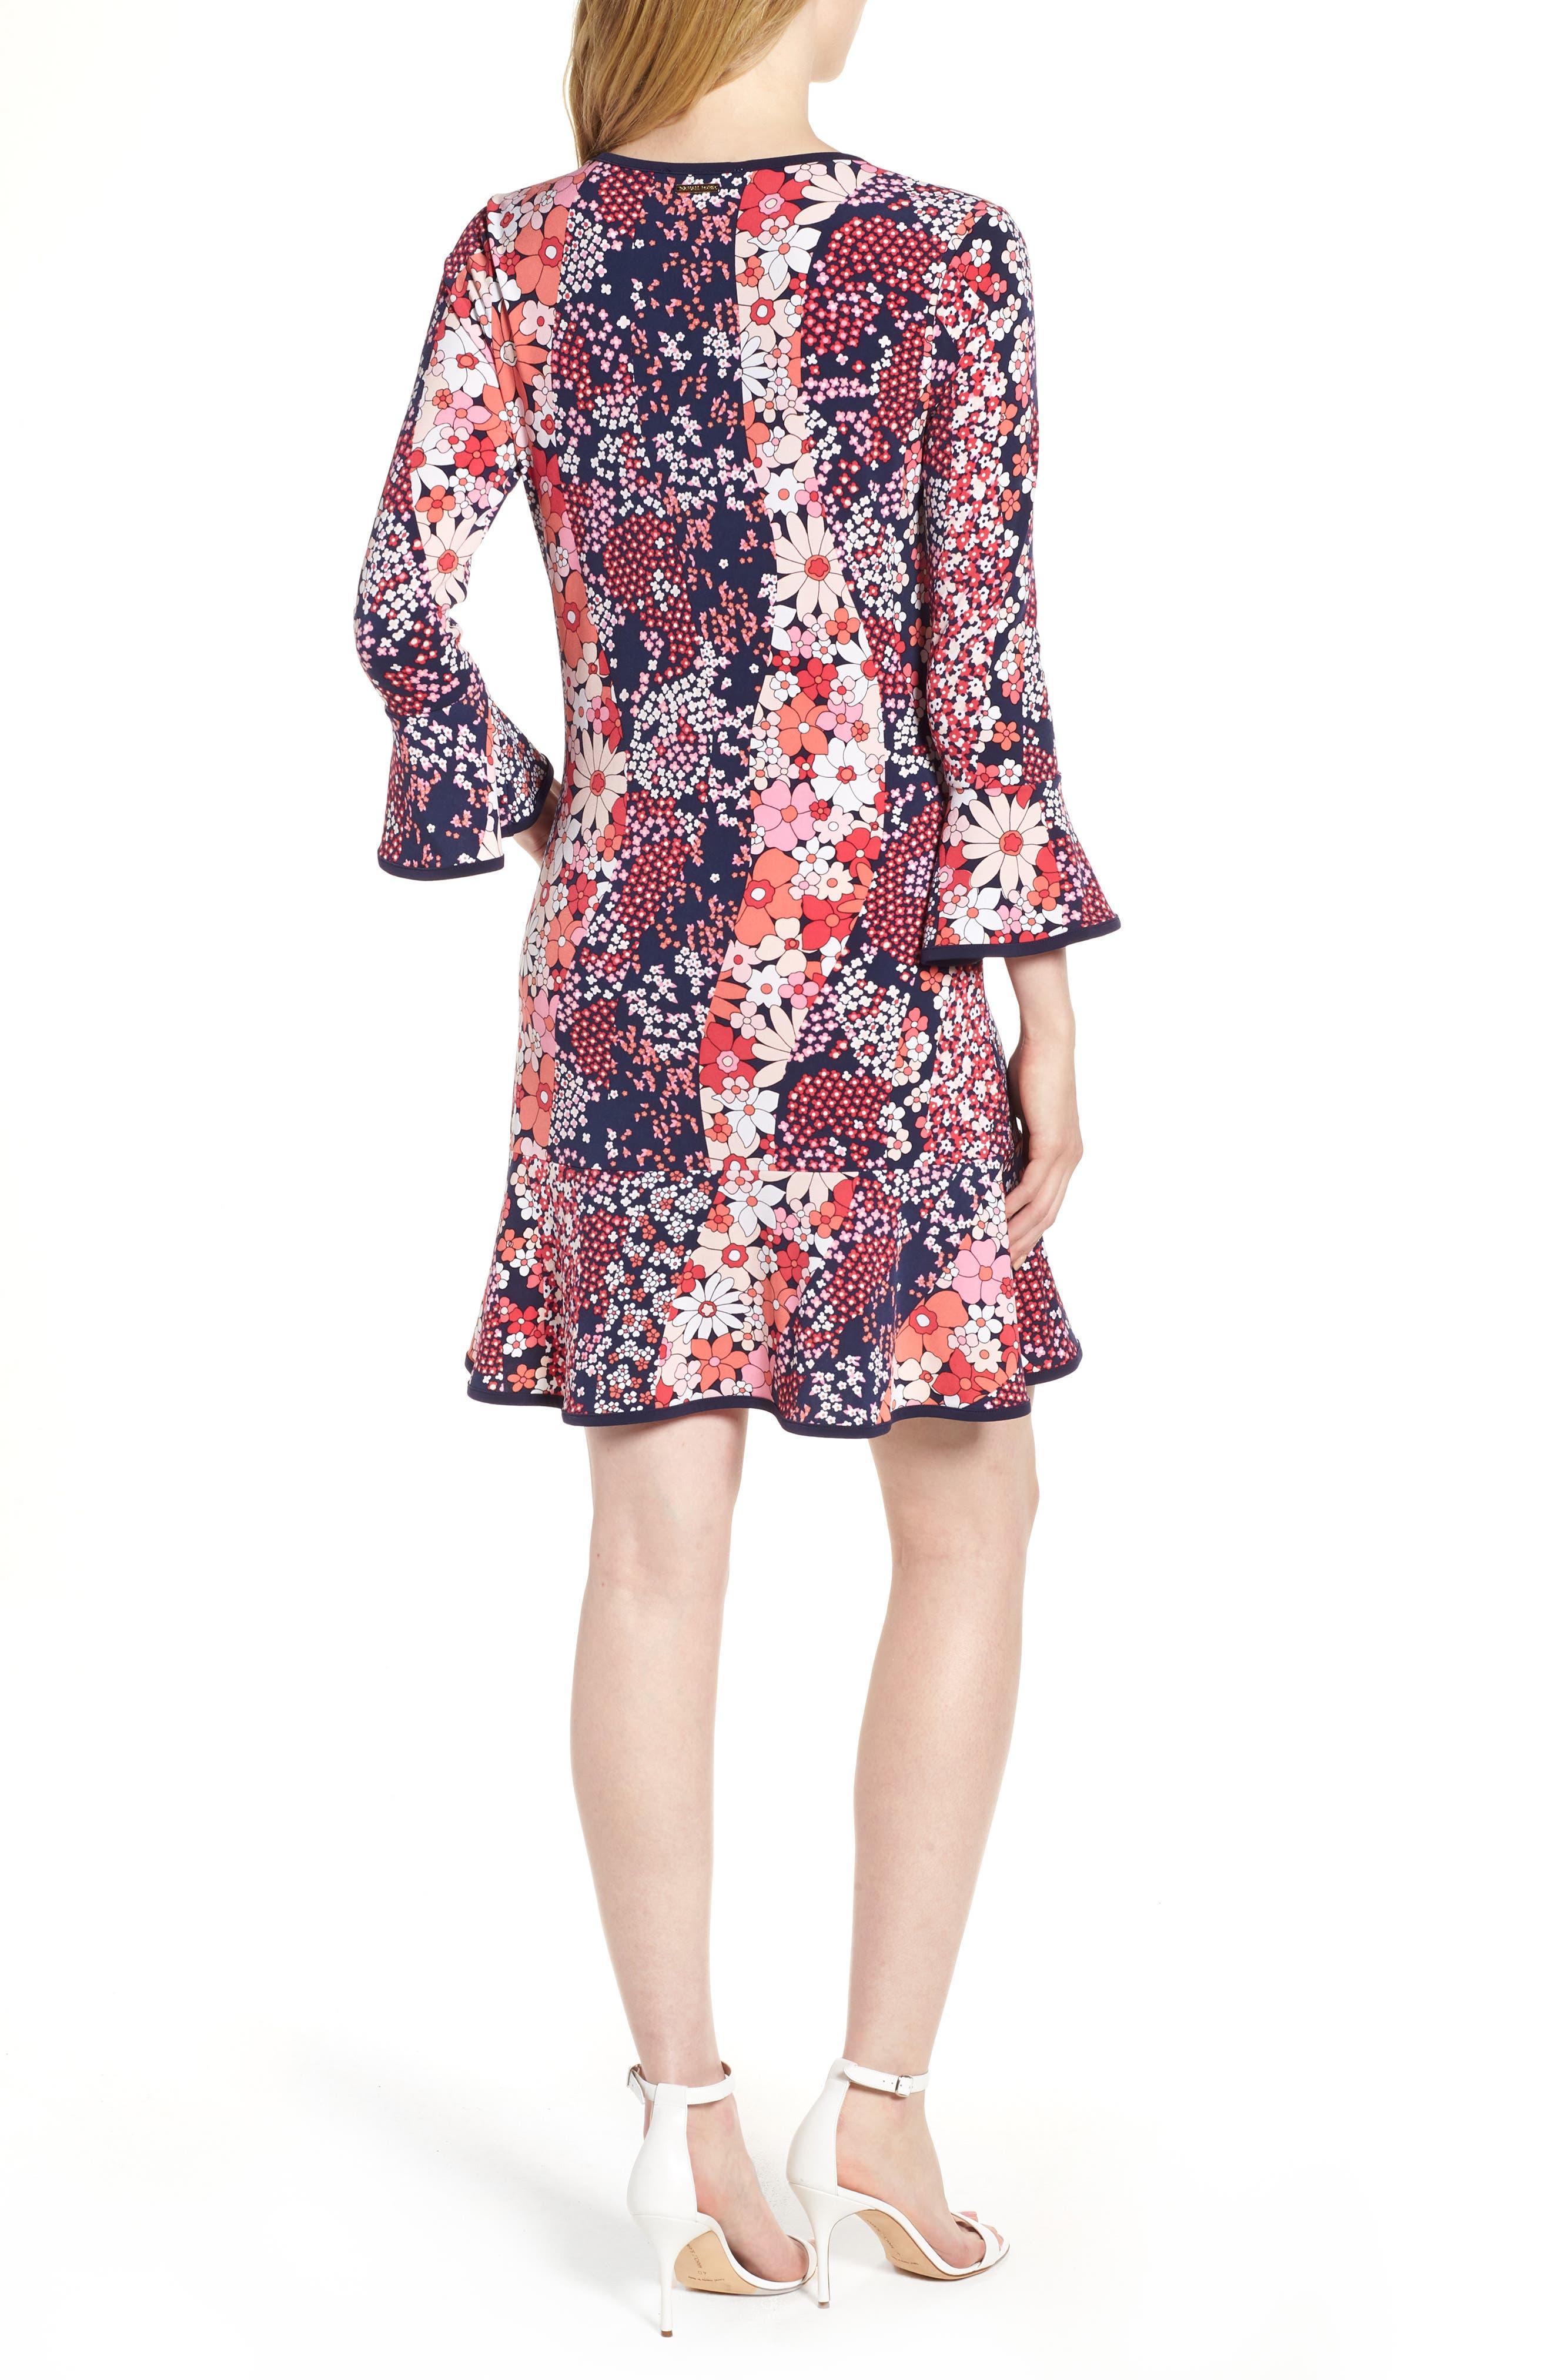 Patch Flower Flounce Dress,                             Alternate thumbnail 2, color,                             True Navy/ Bright Blush